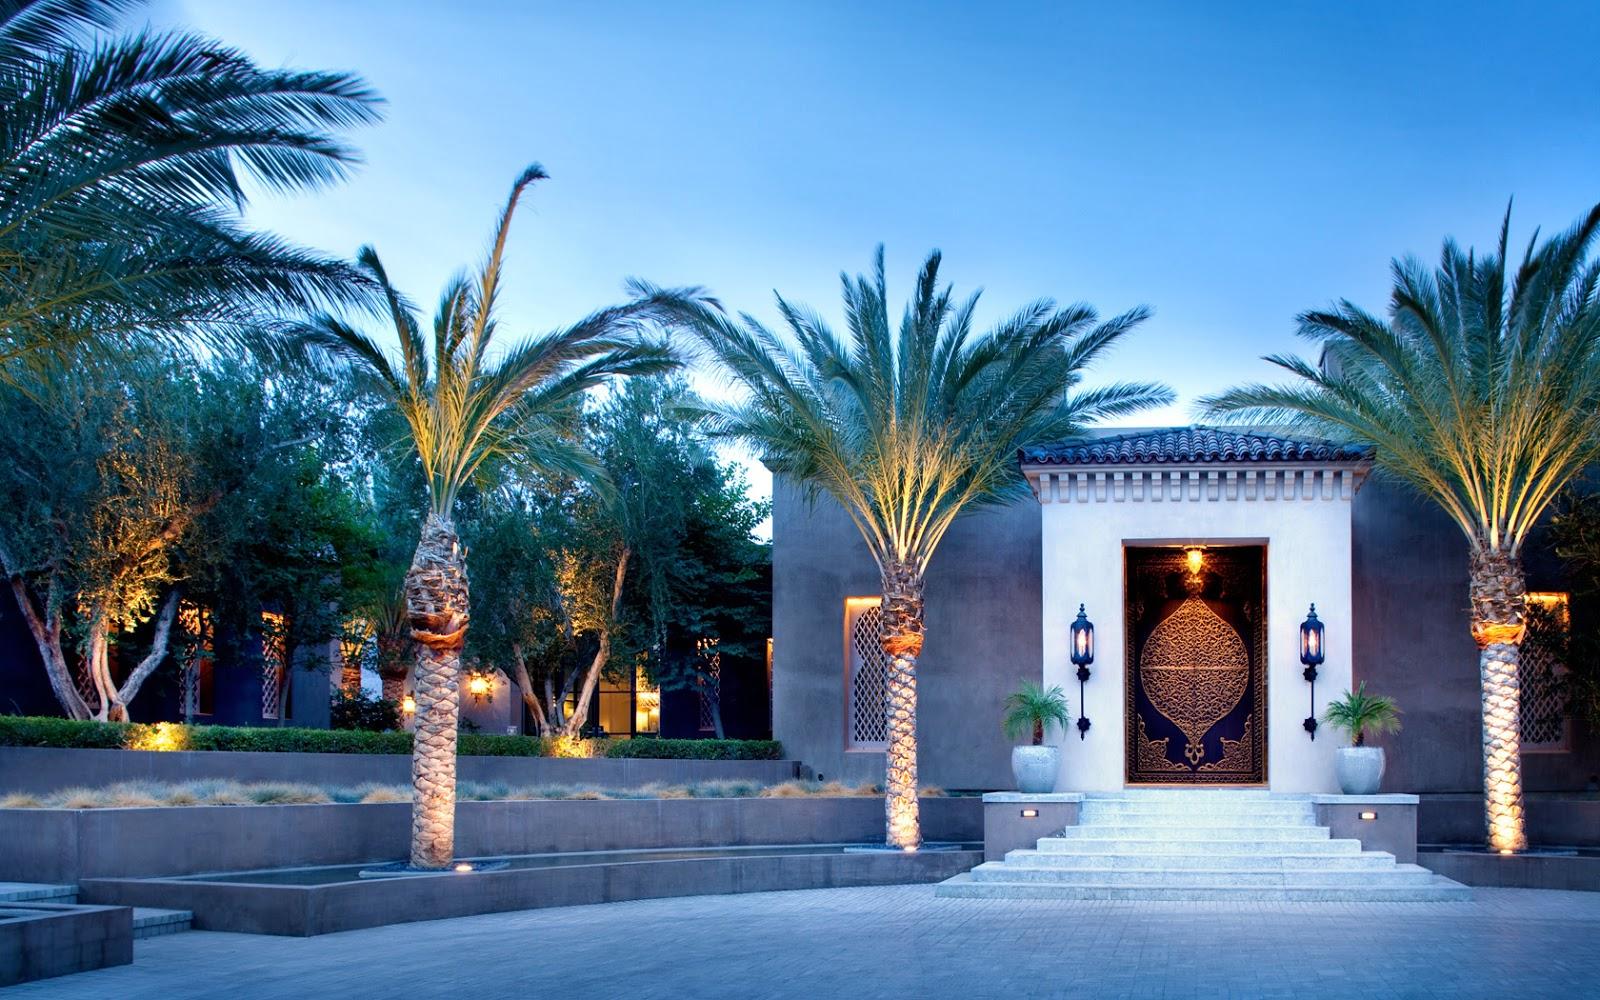 Luxury Life Design: Casbah Cove - Premier Palm Desert ...